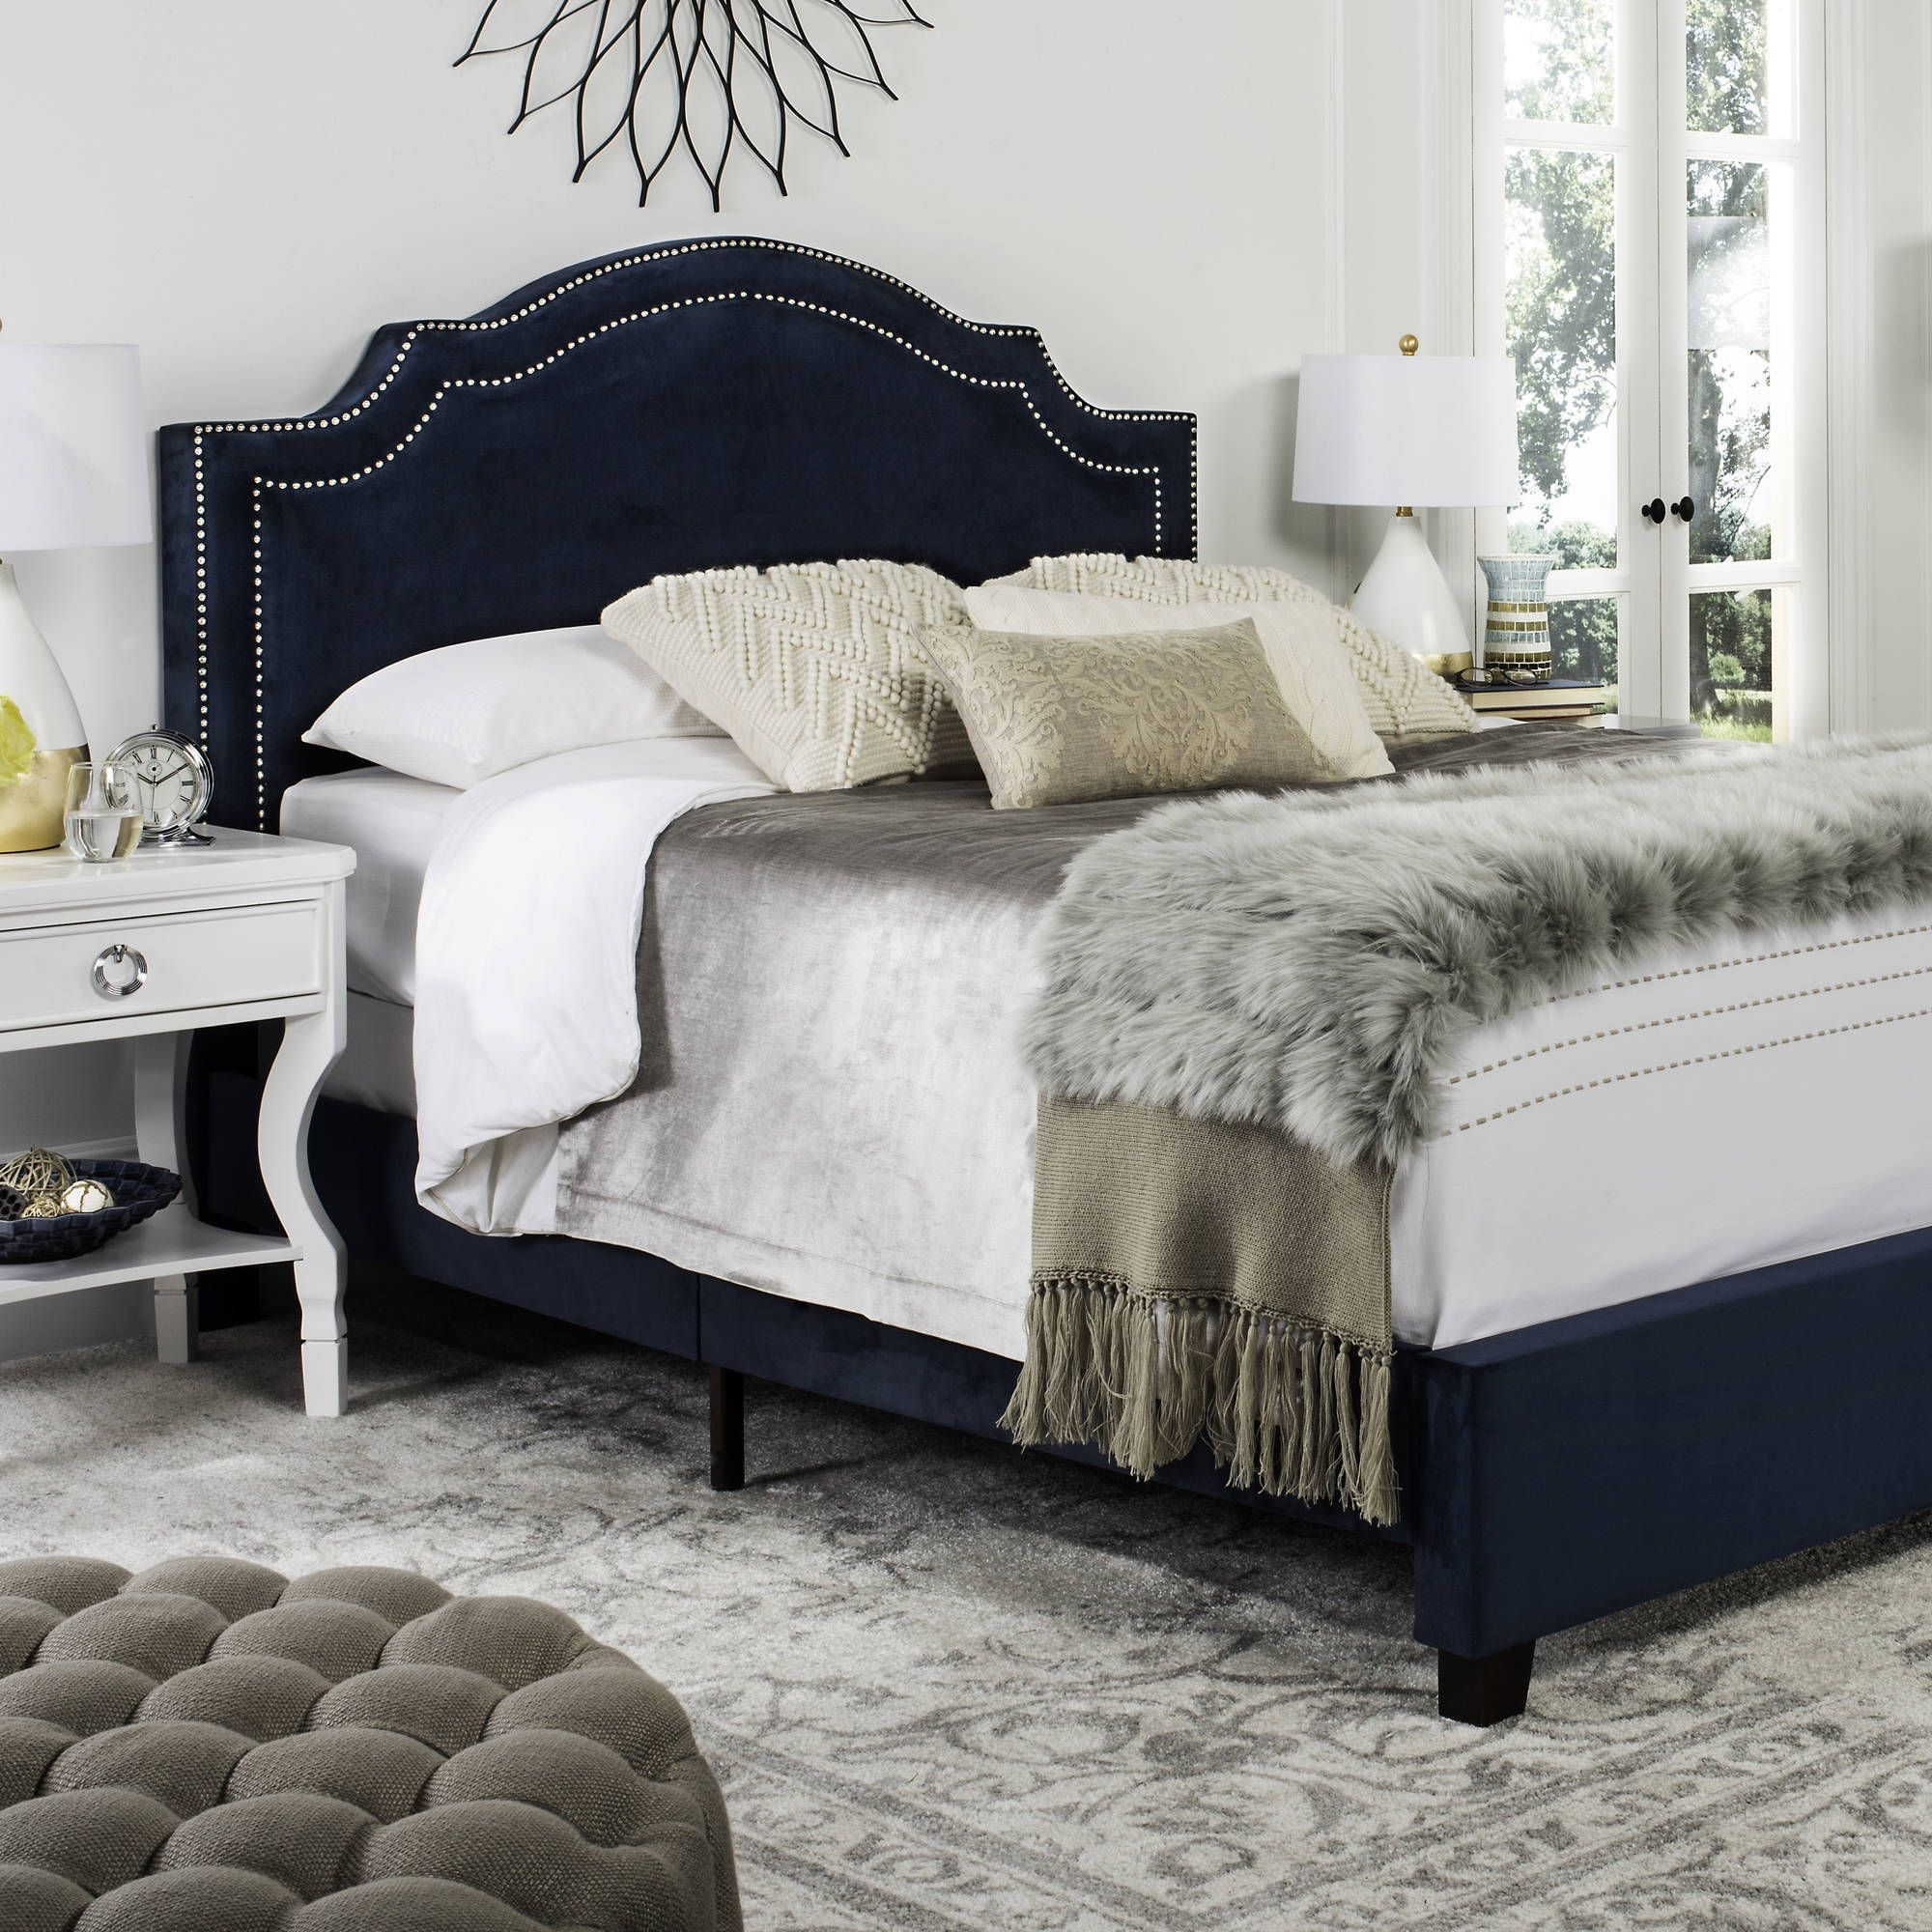 Home Queen Upholstered Bed Upholstered Bed Frame Upholstered